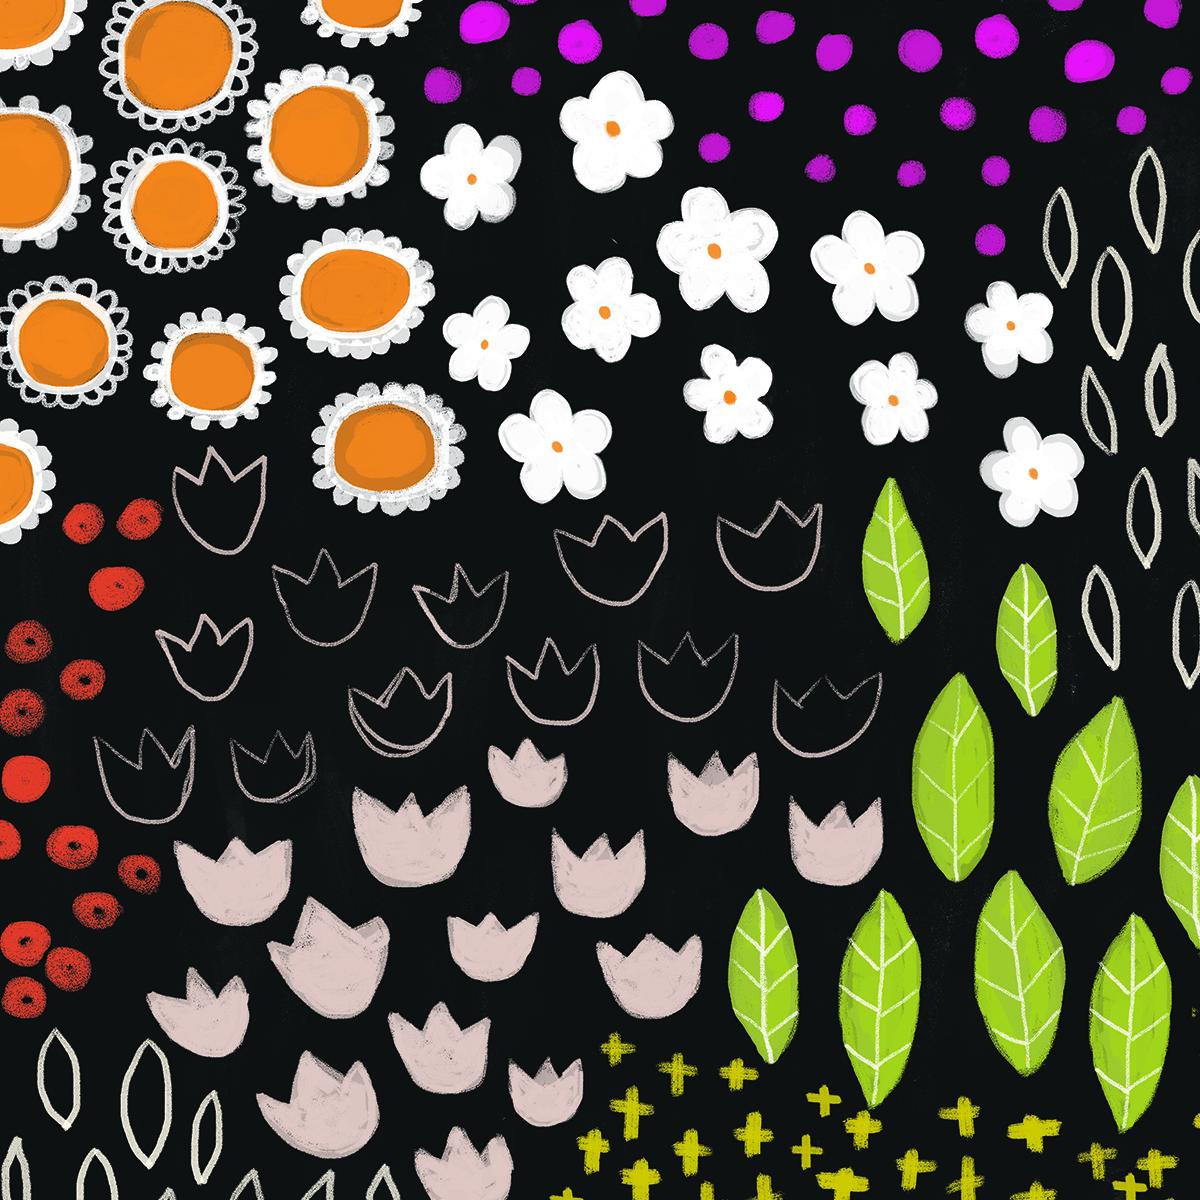 Sarah_Golden_Folk_Florals_Uppercase.jpg